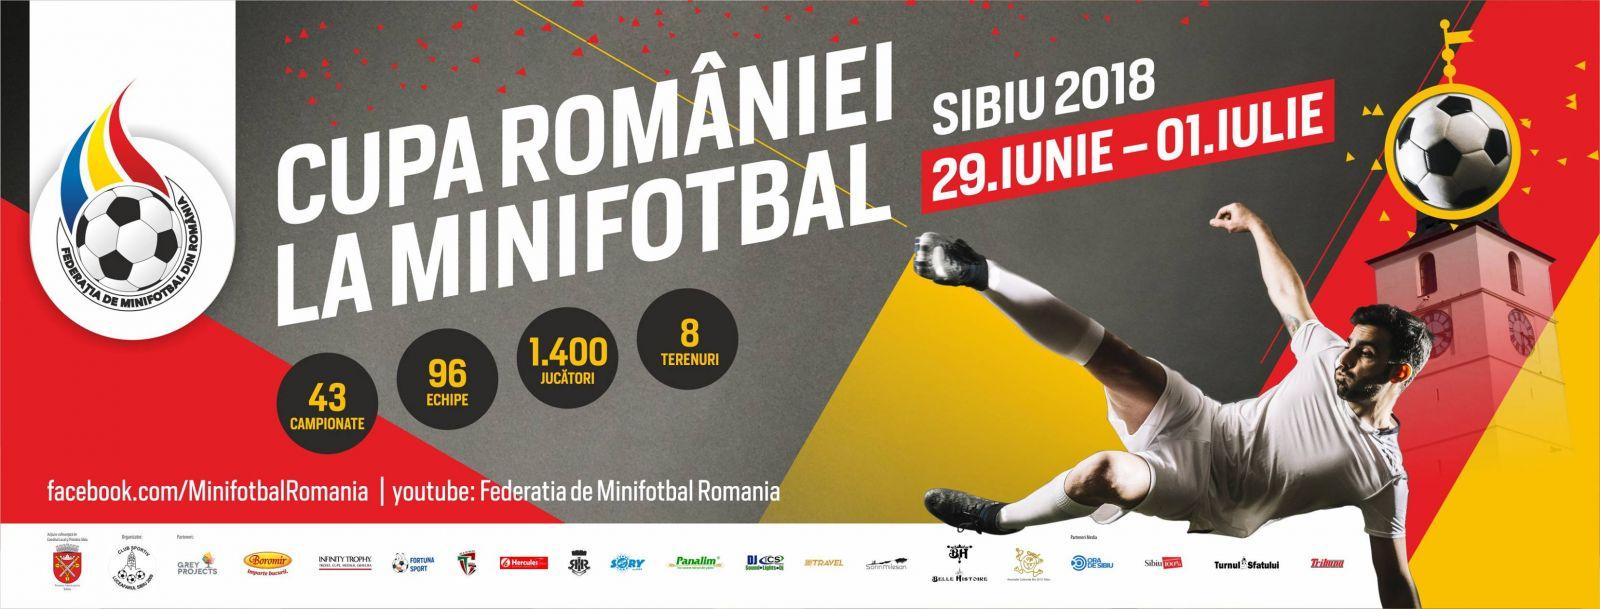 cupa romaniei, minifotbal